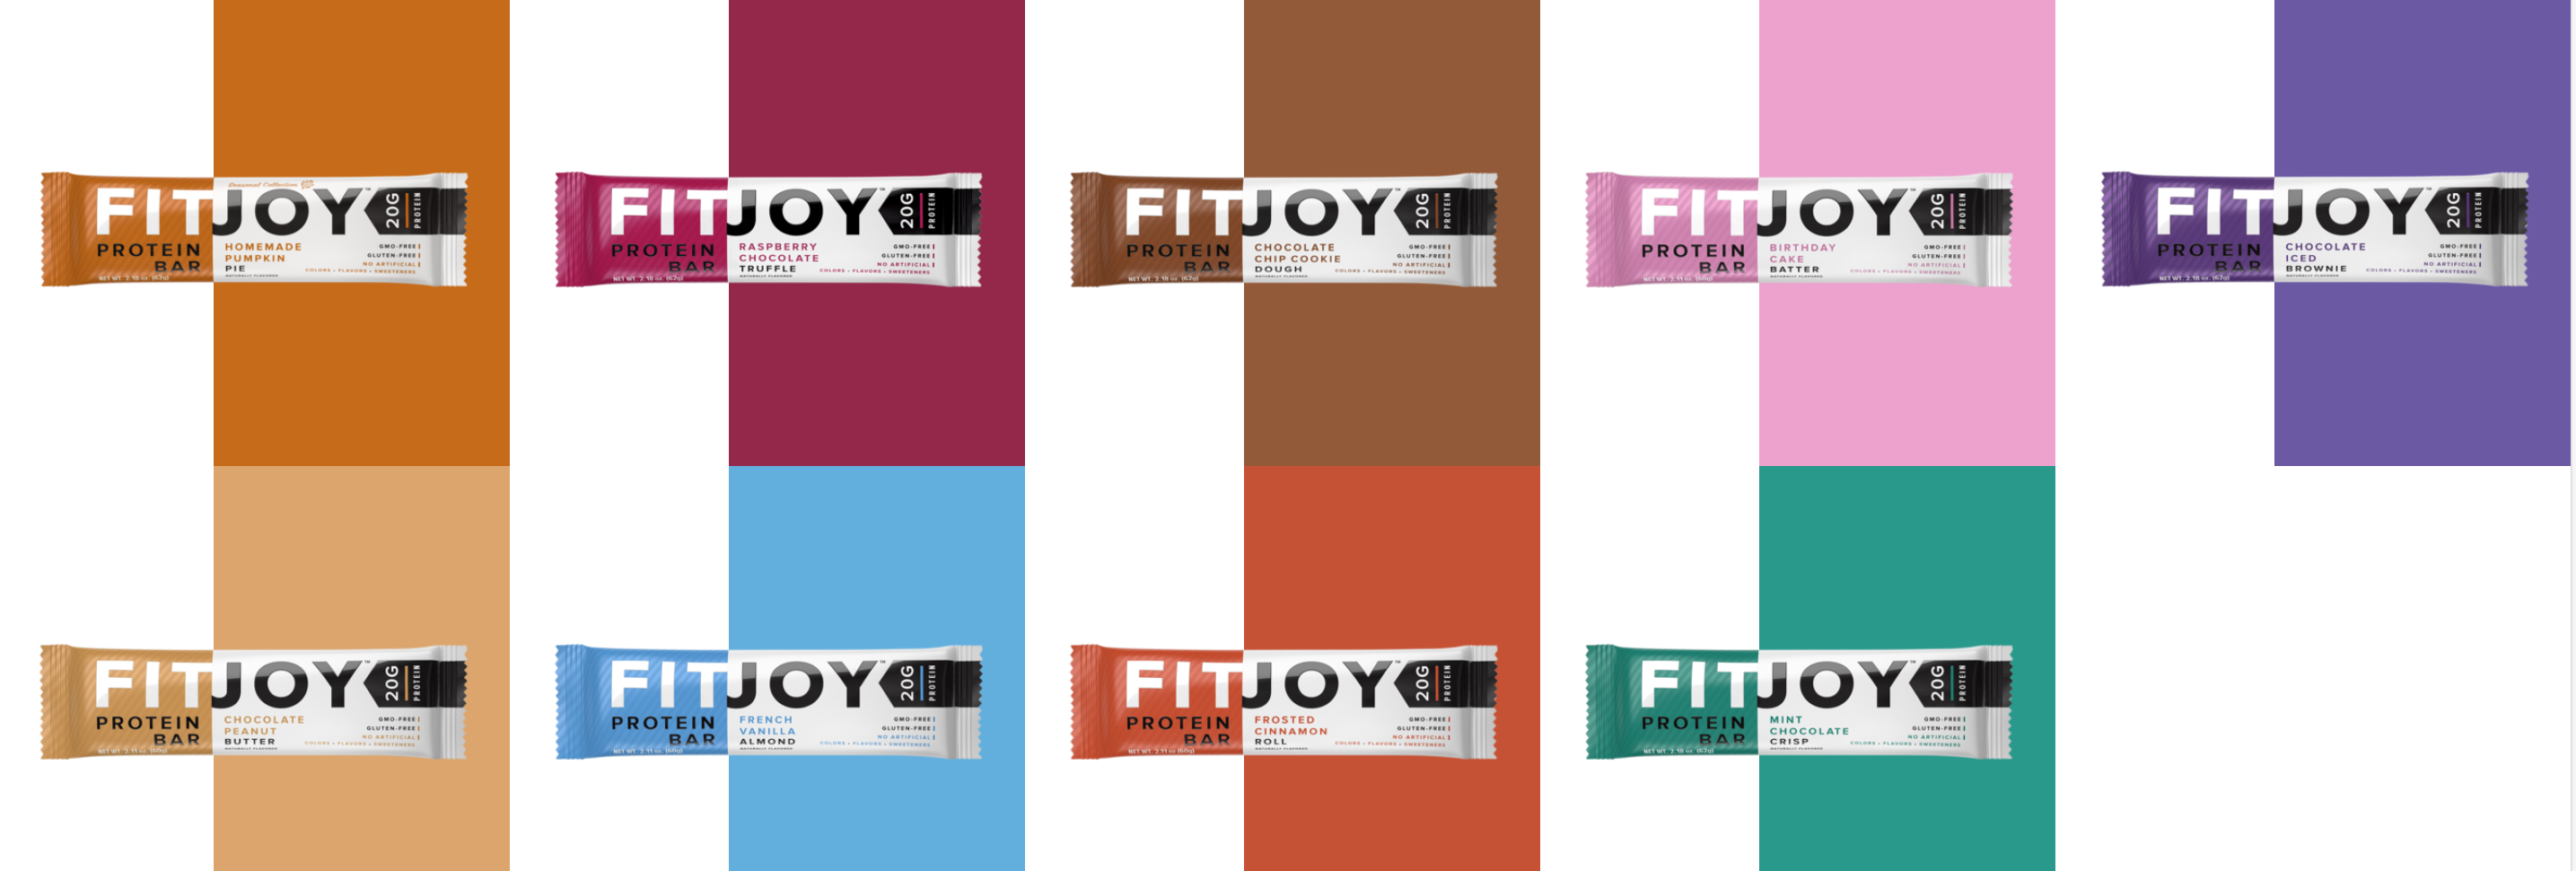 Chocolate Iced Brownie Fitjoy